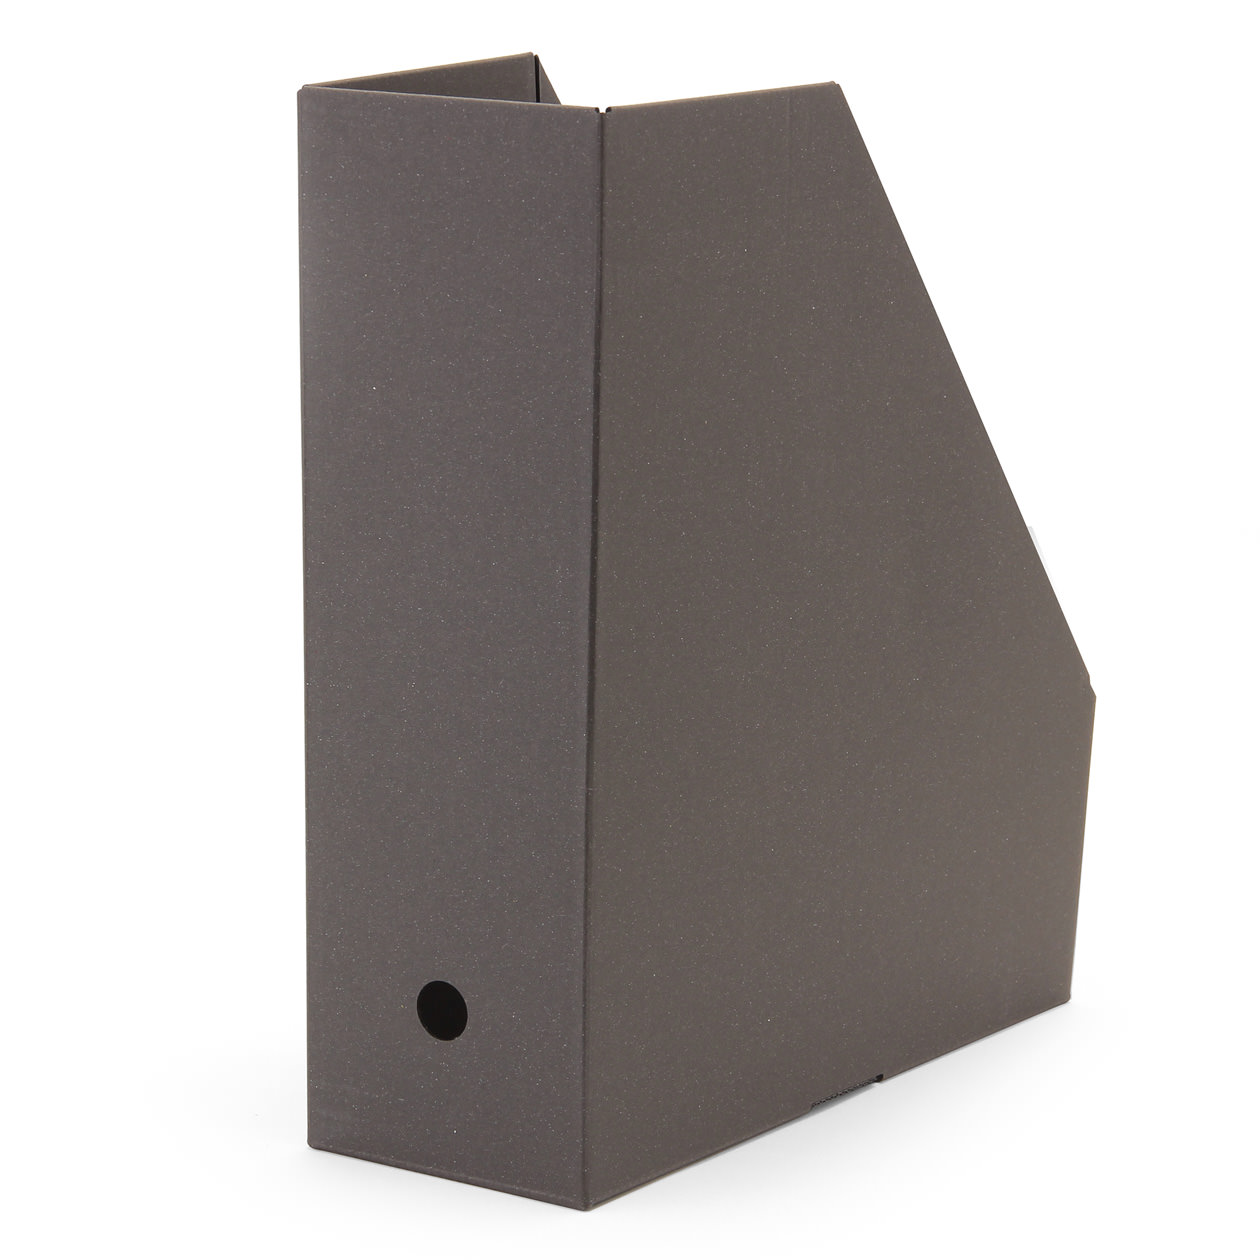 RoomClip商品情報 - ワンタッチで組み立てられるダンボールスタンドファイルボックス